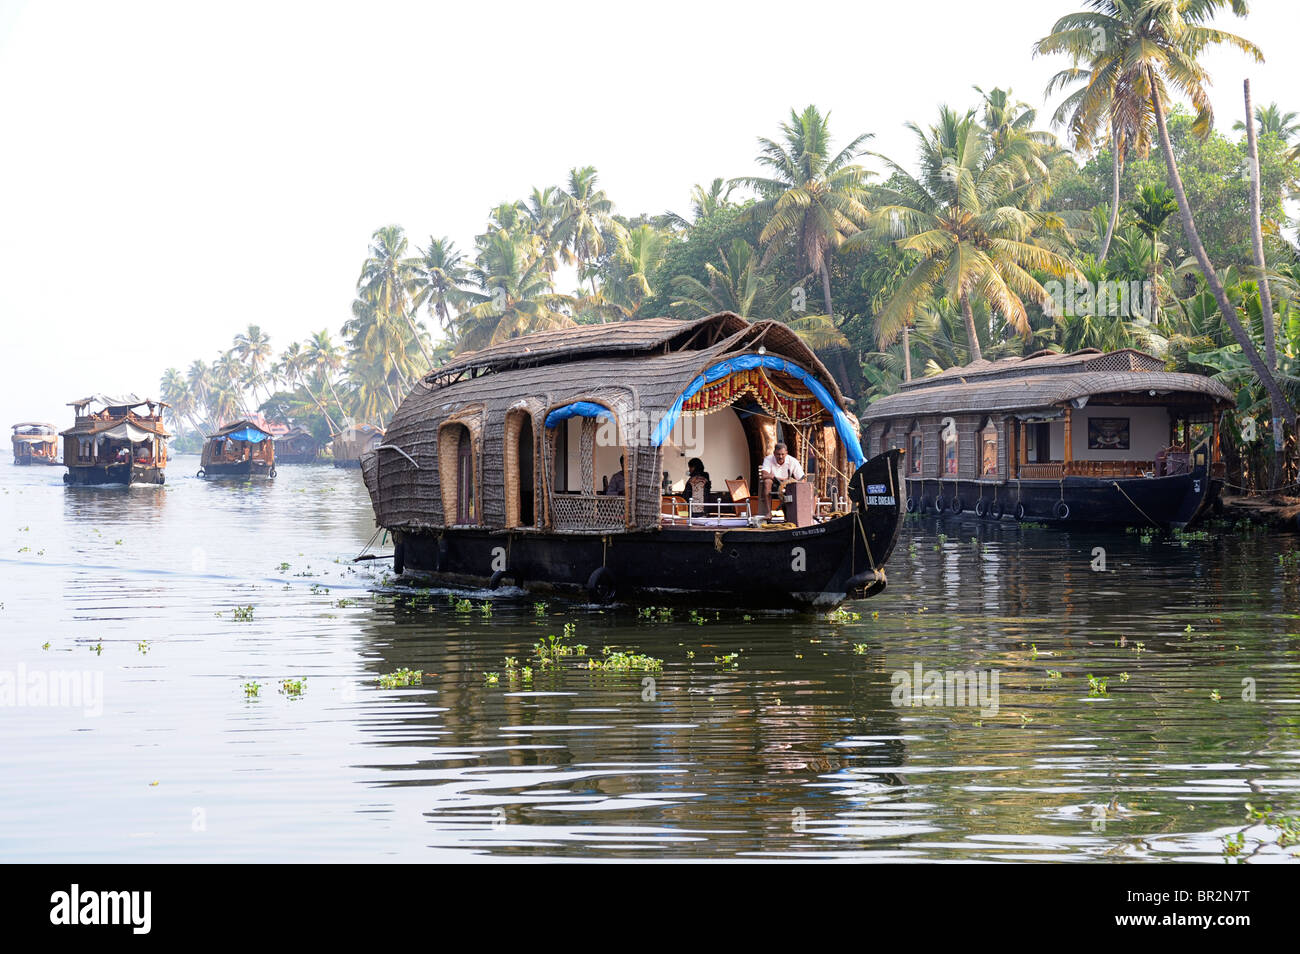 Case galleggianti sulle lagune, del Kerala, India Immagini Stock